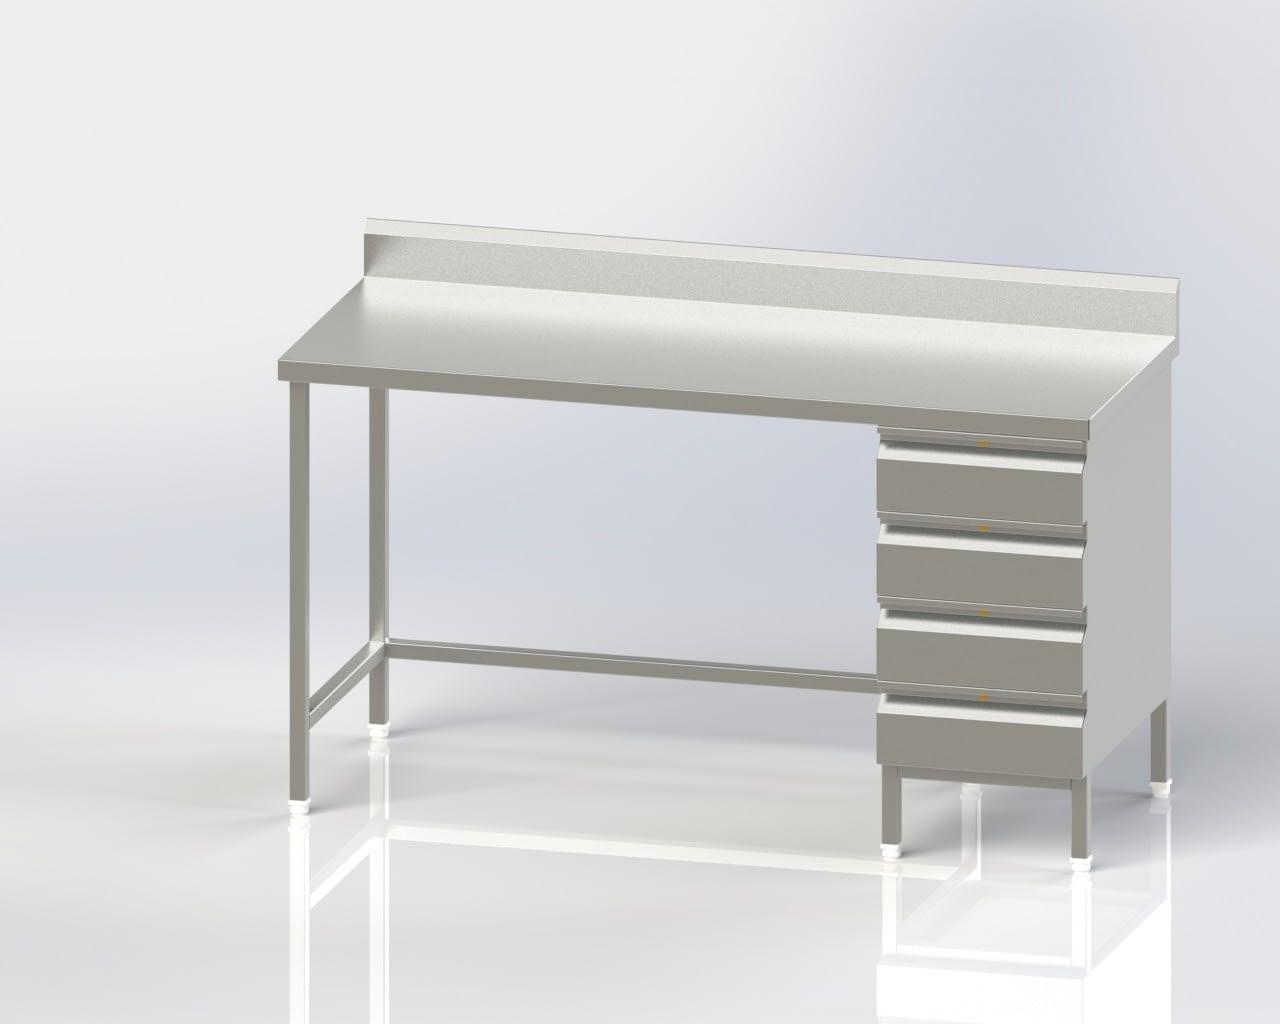 Work Table/4 Drawer with back splash